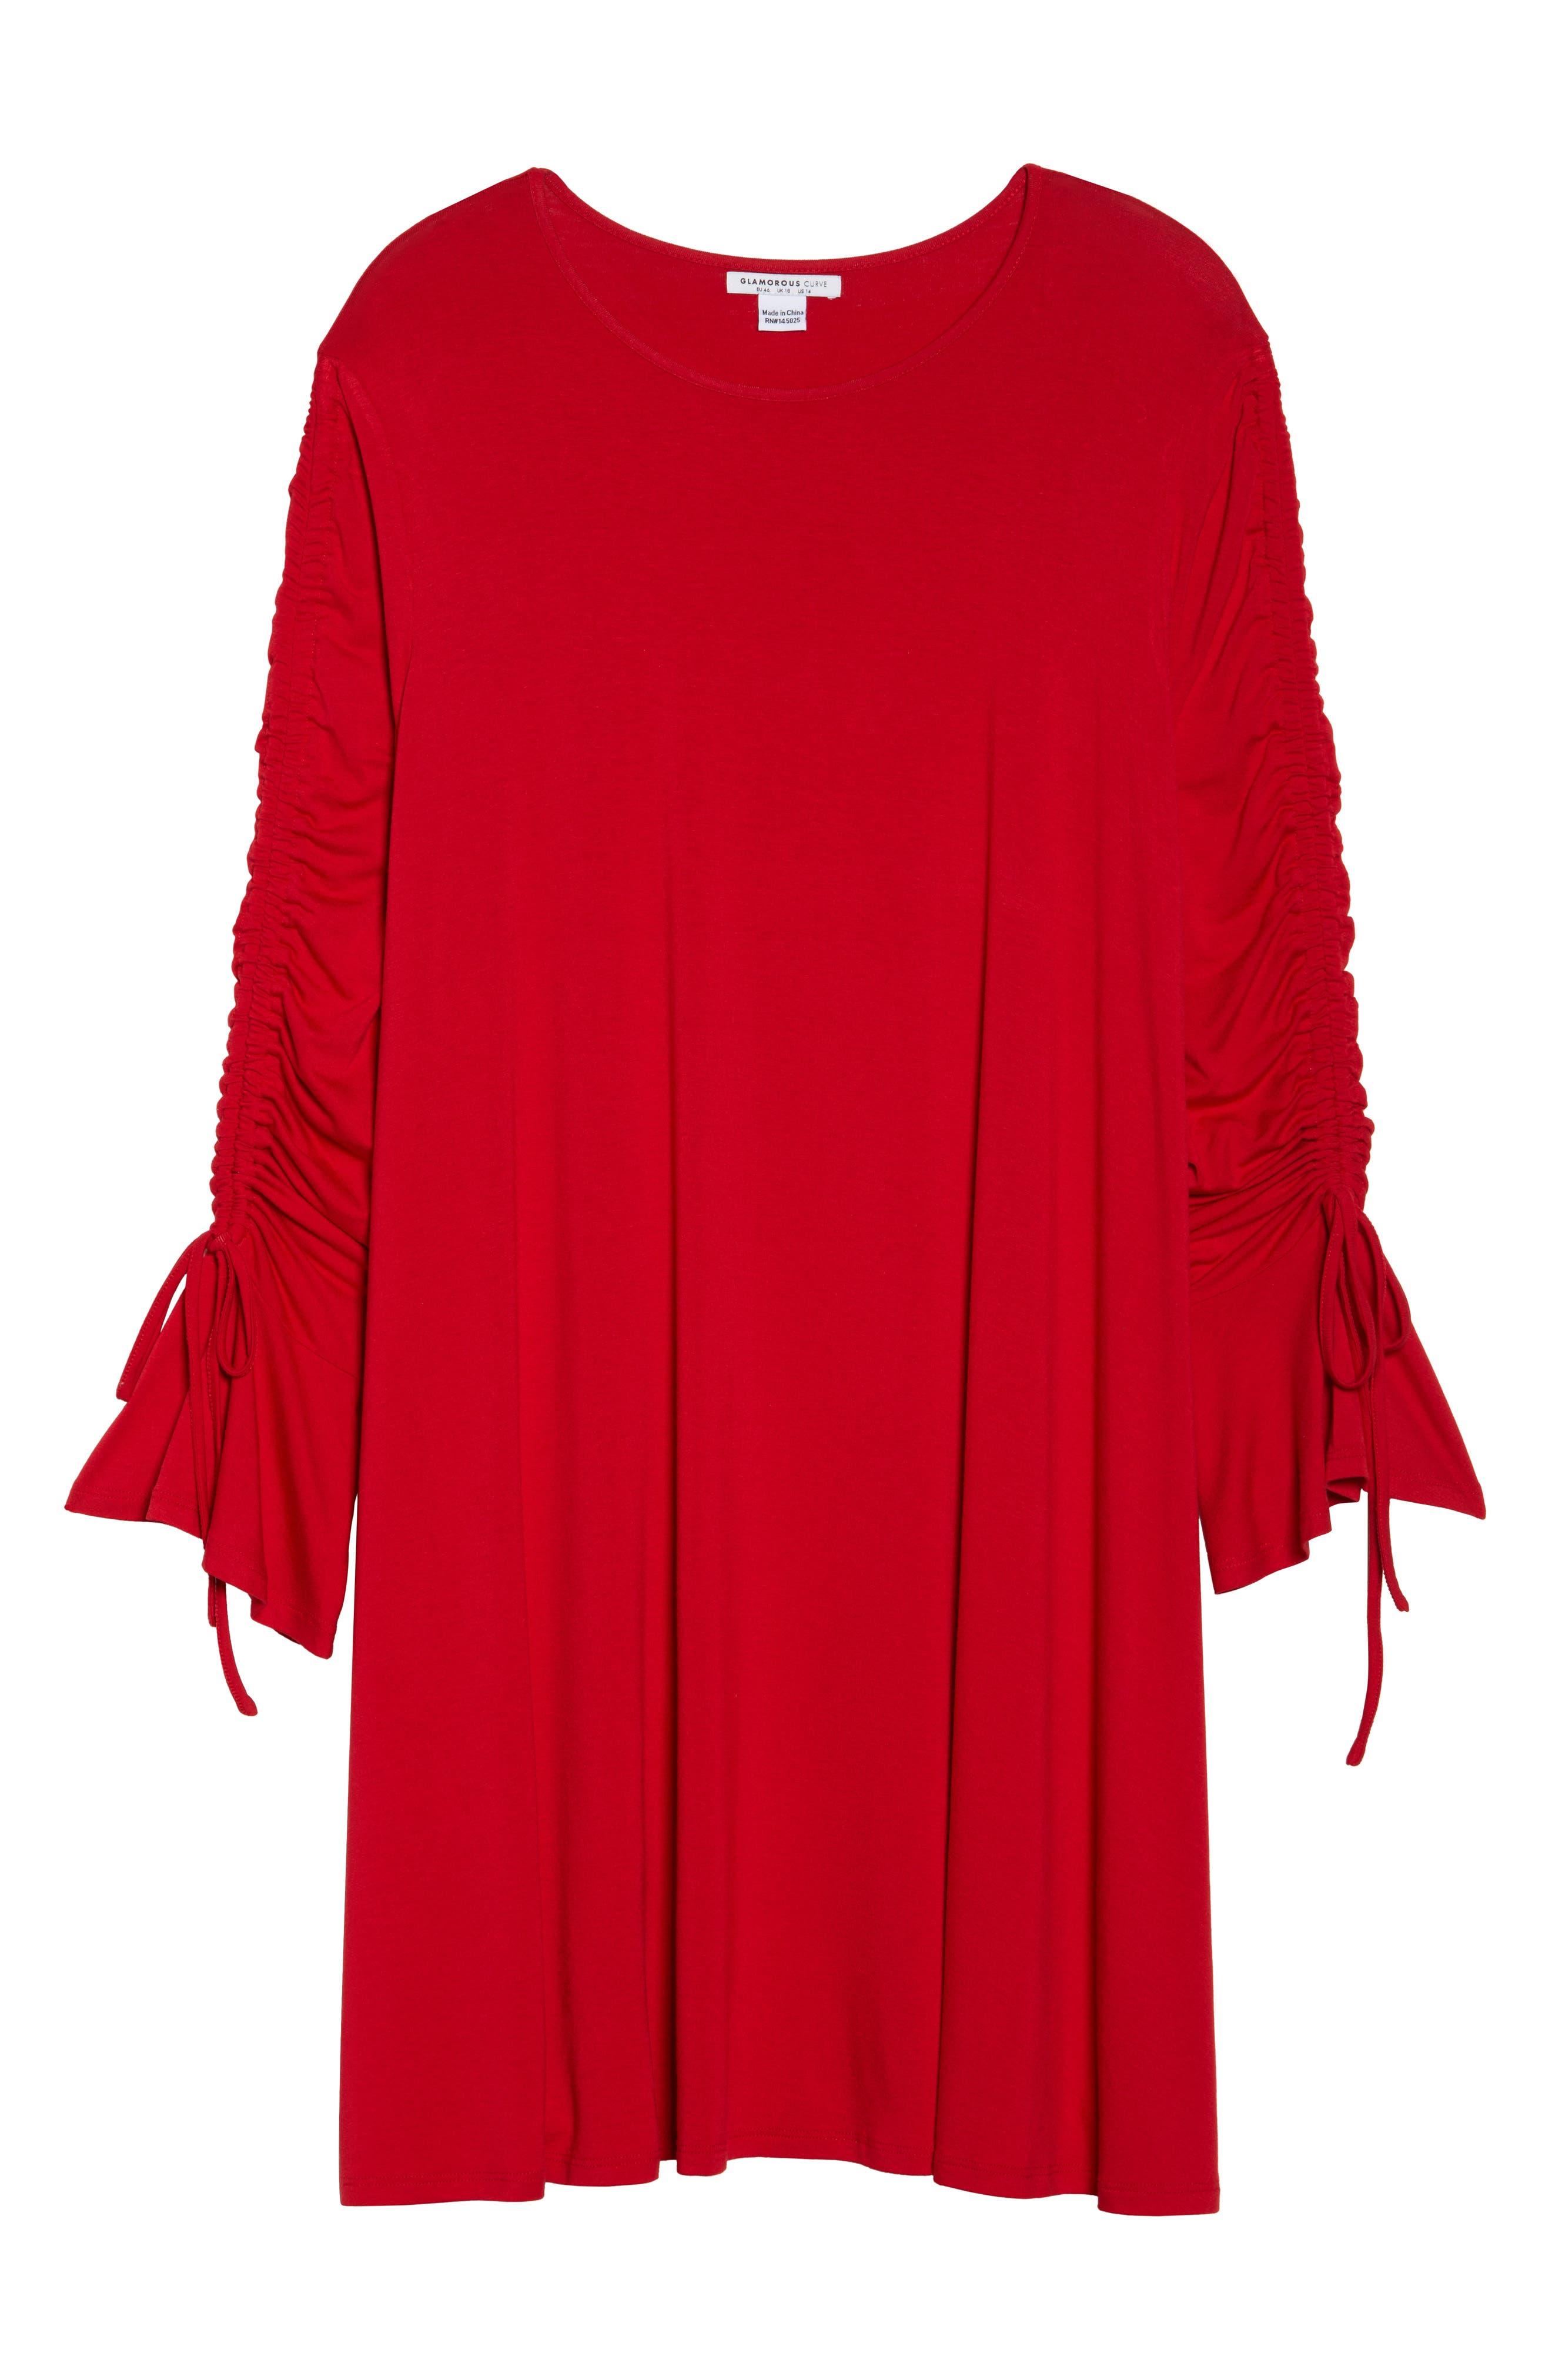 Tulip Sleeve Shift Dress,                             Alternate thumbnail 6, color,                             Red